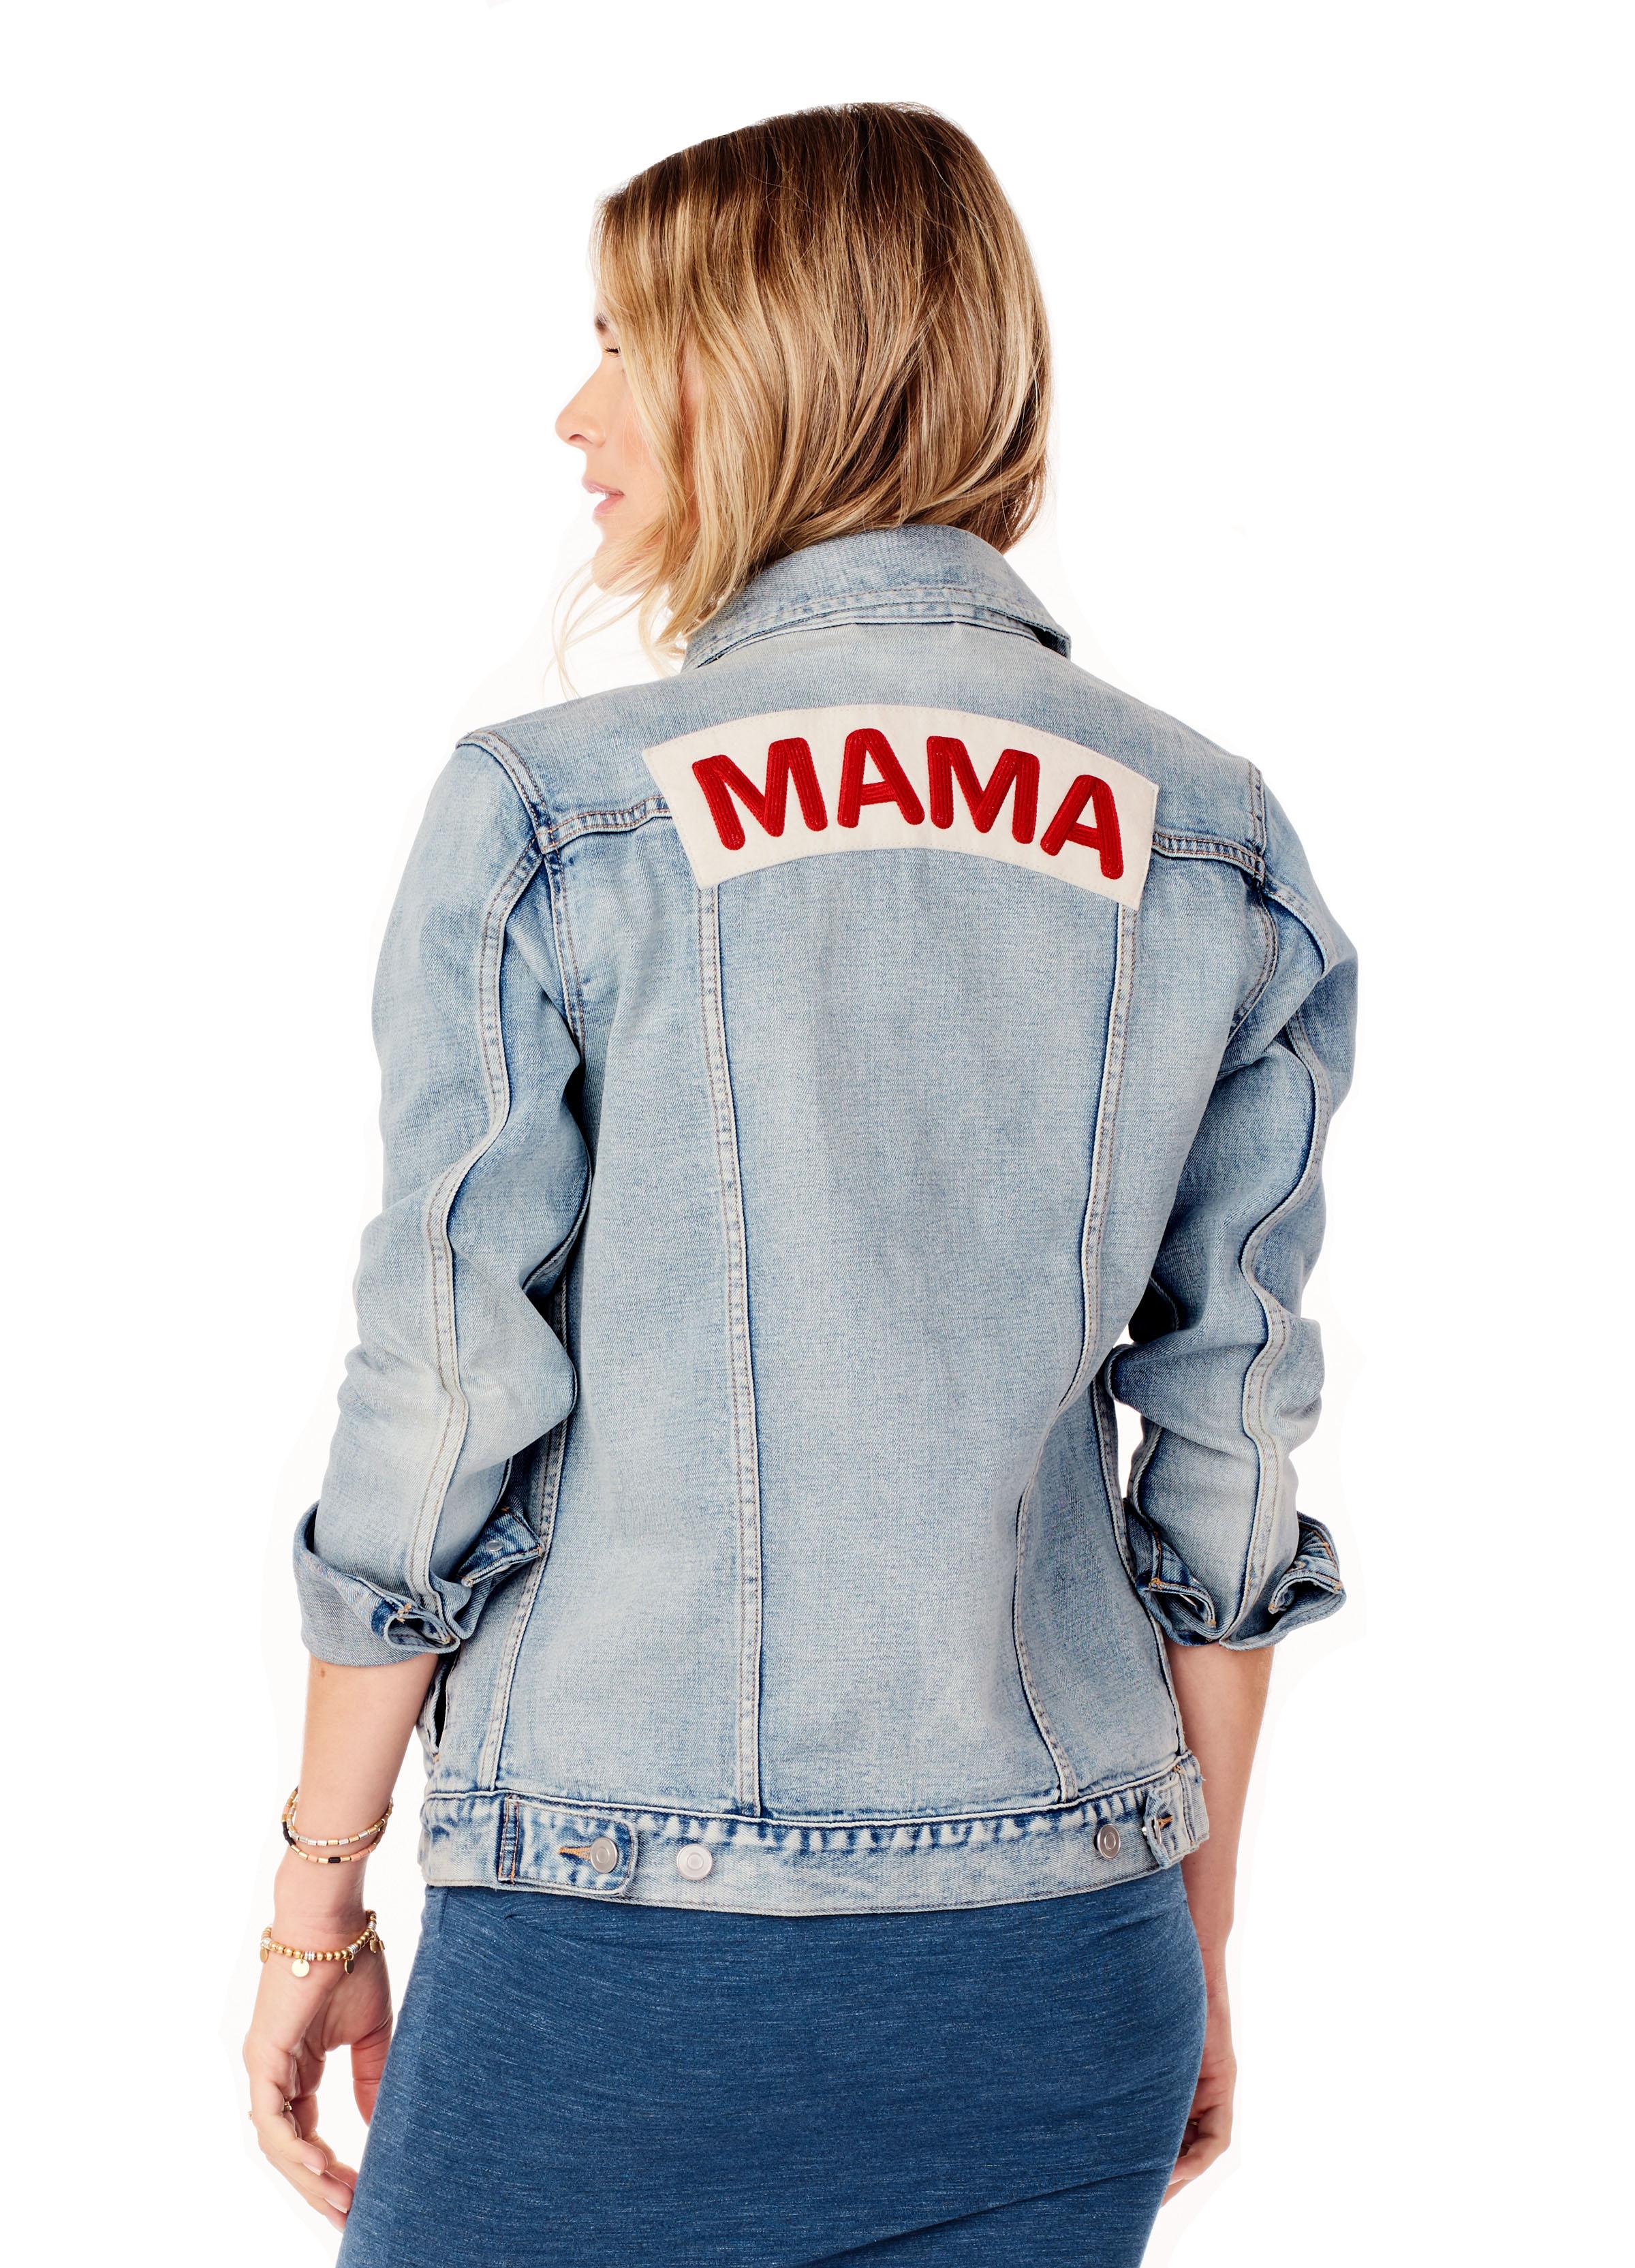 Mama Denim Jacket • Ingrid & Isabel